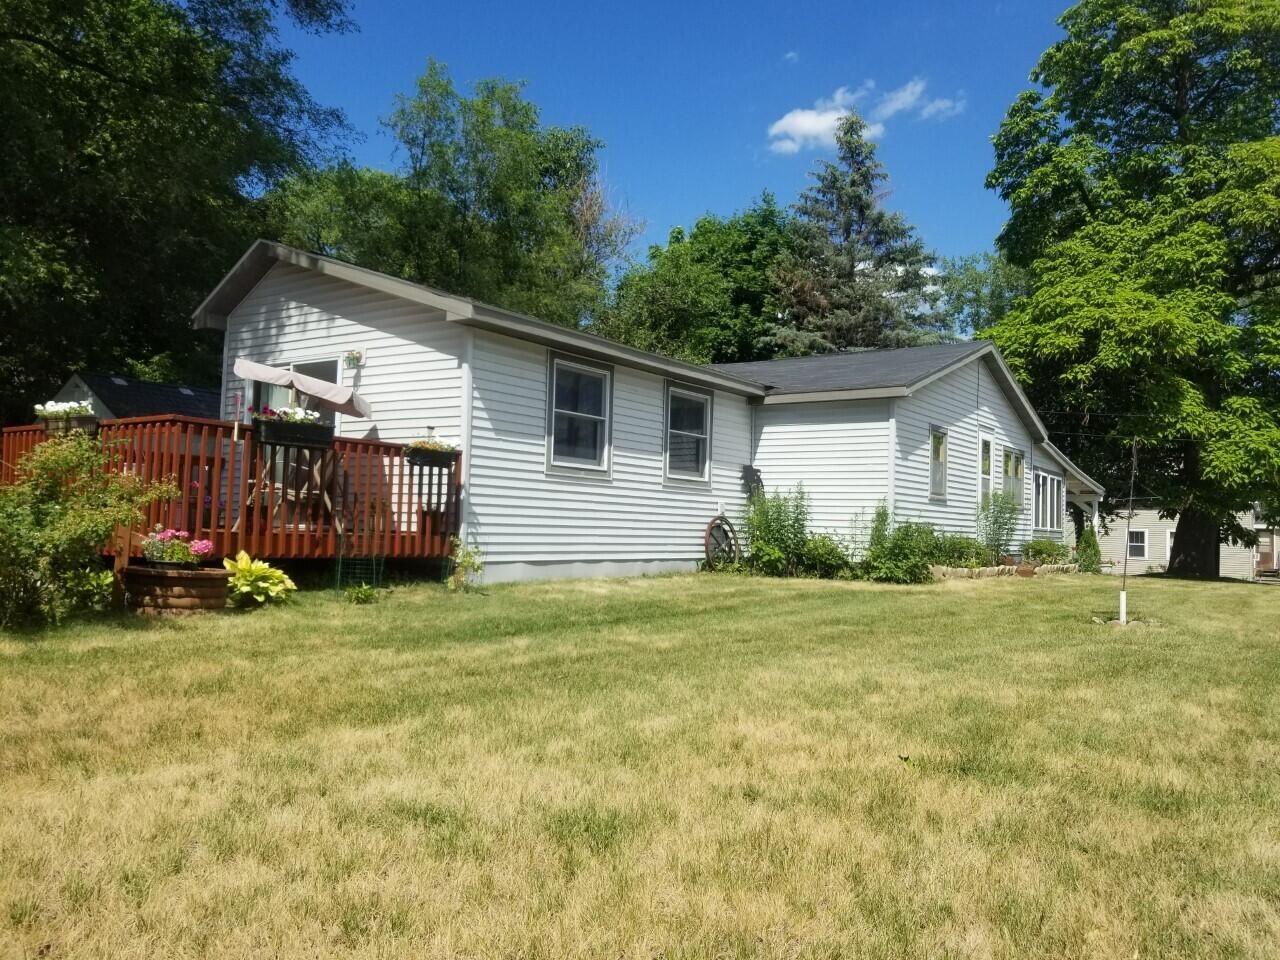 1706 Monroe St, Winona, MN 55987 - MLS#: 1748687